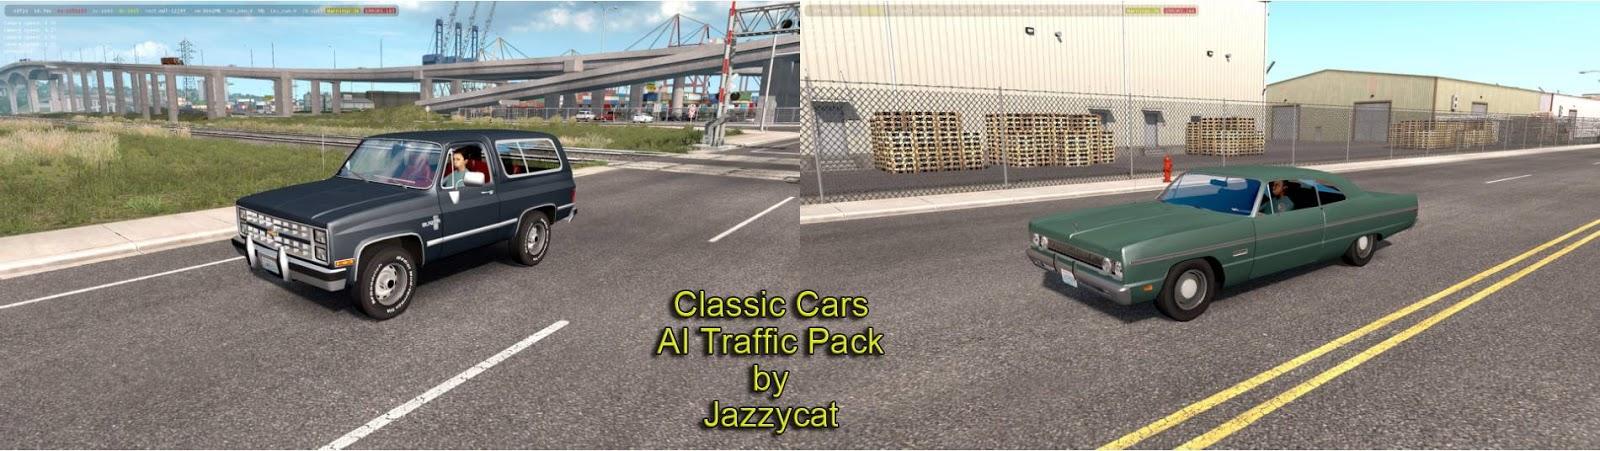 Sinagrit Baba's Workshop: ATS - Classic Cars AI Traffic Pack